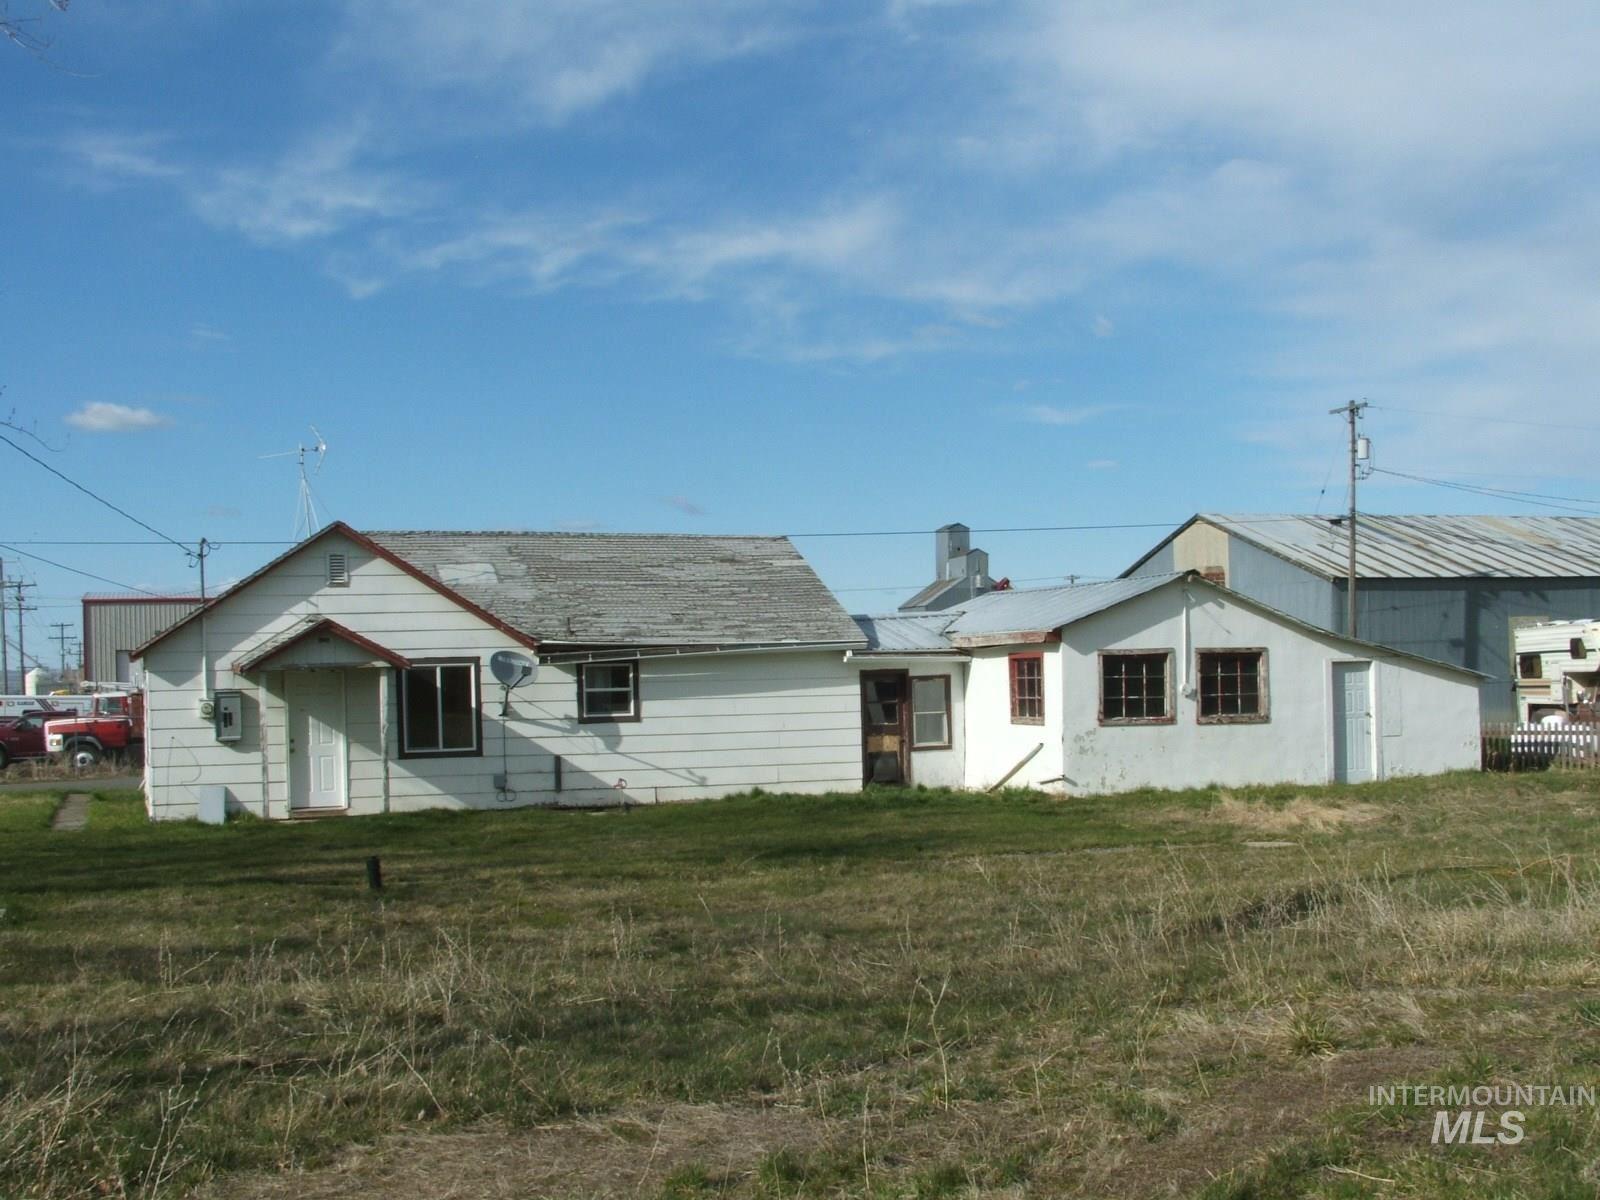 Photo of 715 N A Street, Grangeville, ID 83530 (MLS # 98799844)